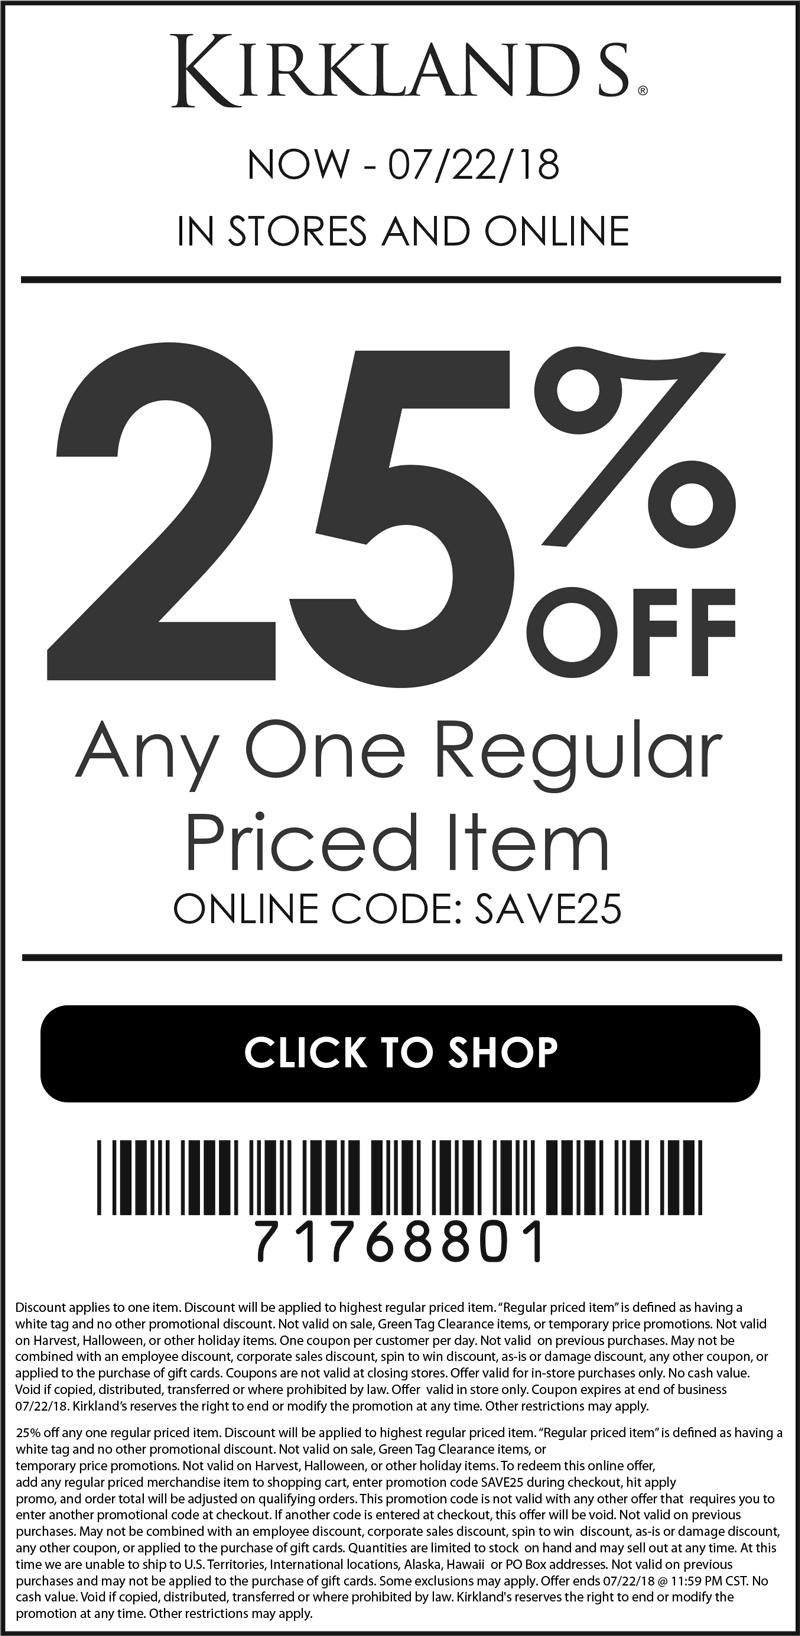 Kirklands.com Promo Coupon 25% off a single item at Kirklands, or online via promo code SAVE25